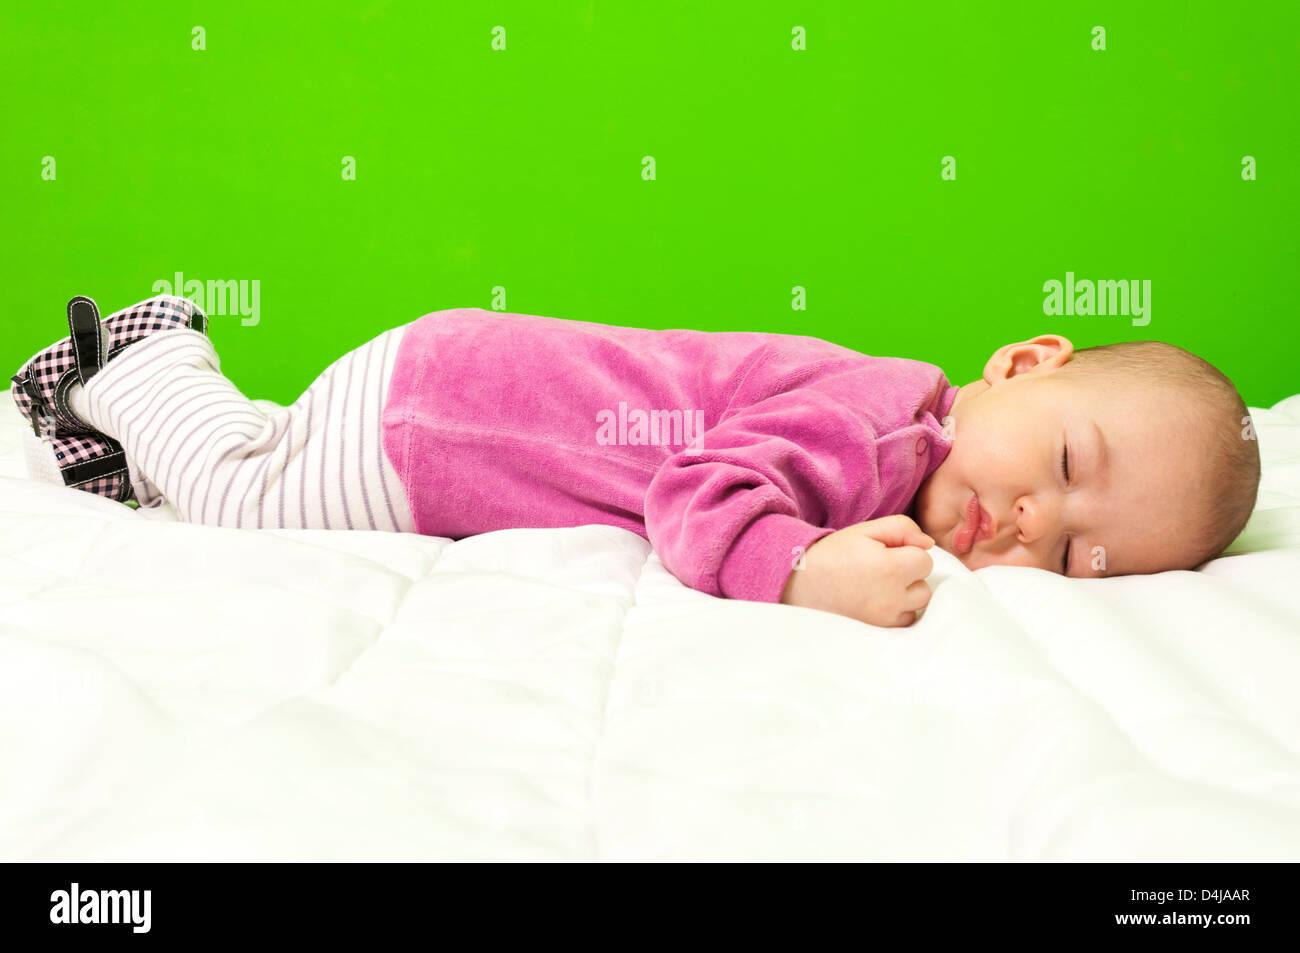 Sleeping baby girl on the white blanket - Stock Image